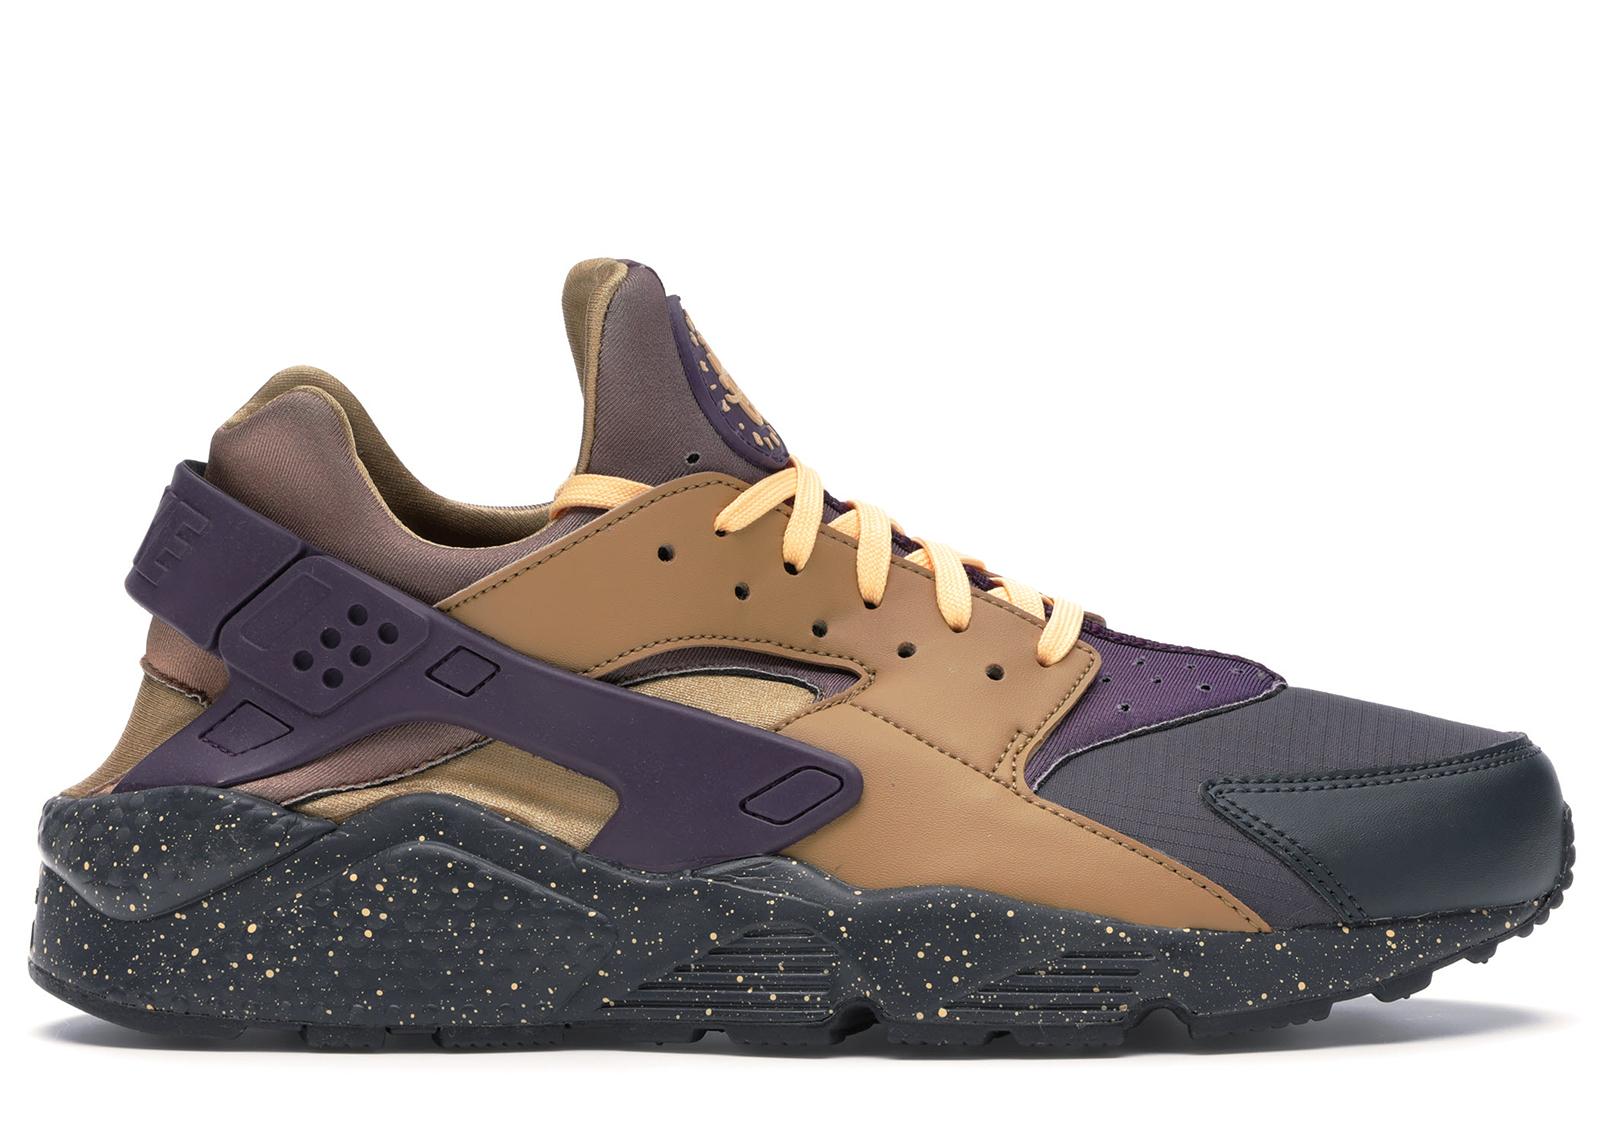 Nike Air Huarache Run Pro Purple